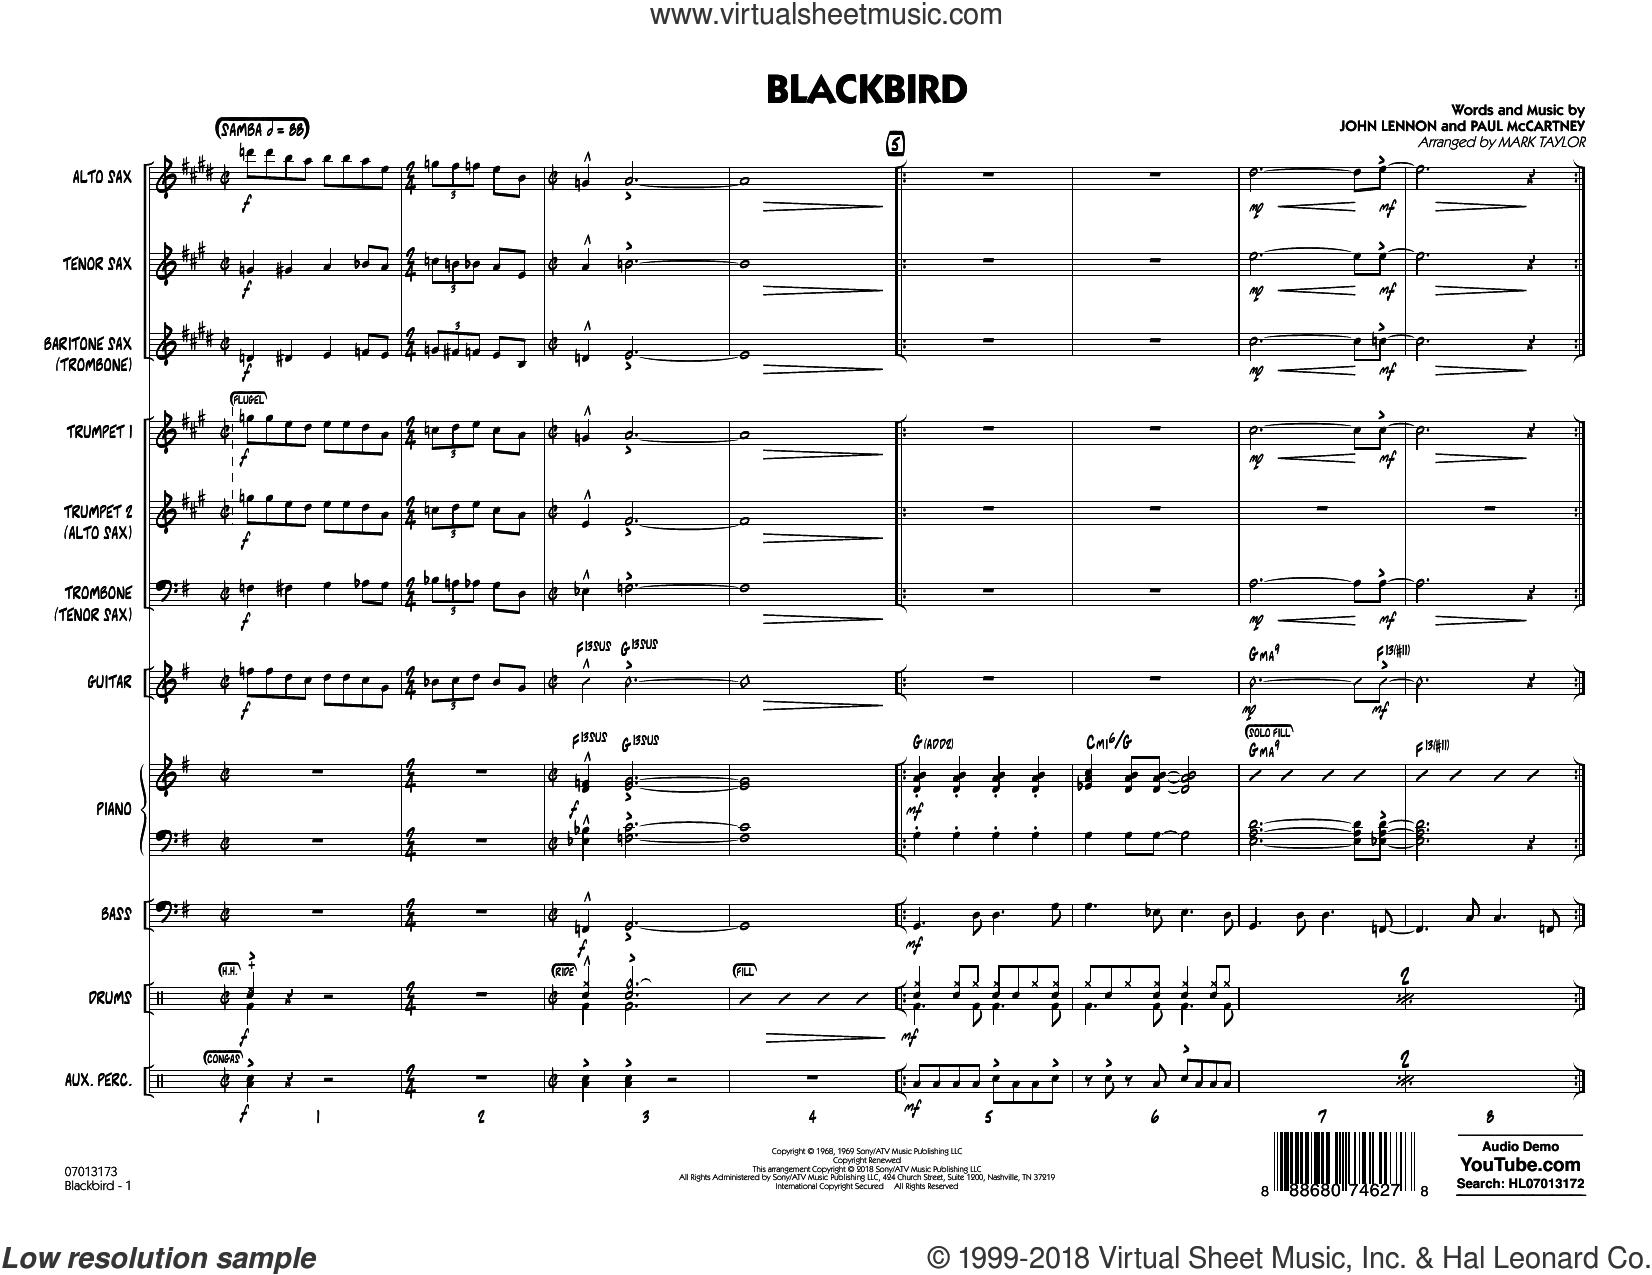 Blackbird (COMPLETE) sheet music for jazz band by The Beatles, John Lennon, Mark Taylor, Paul McCartney and Wings, intermediate skill level